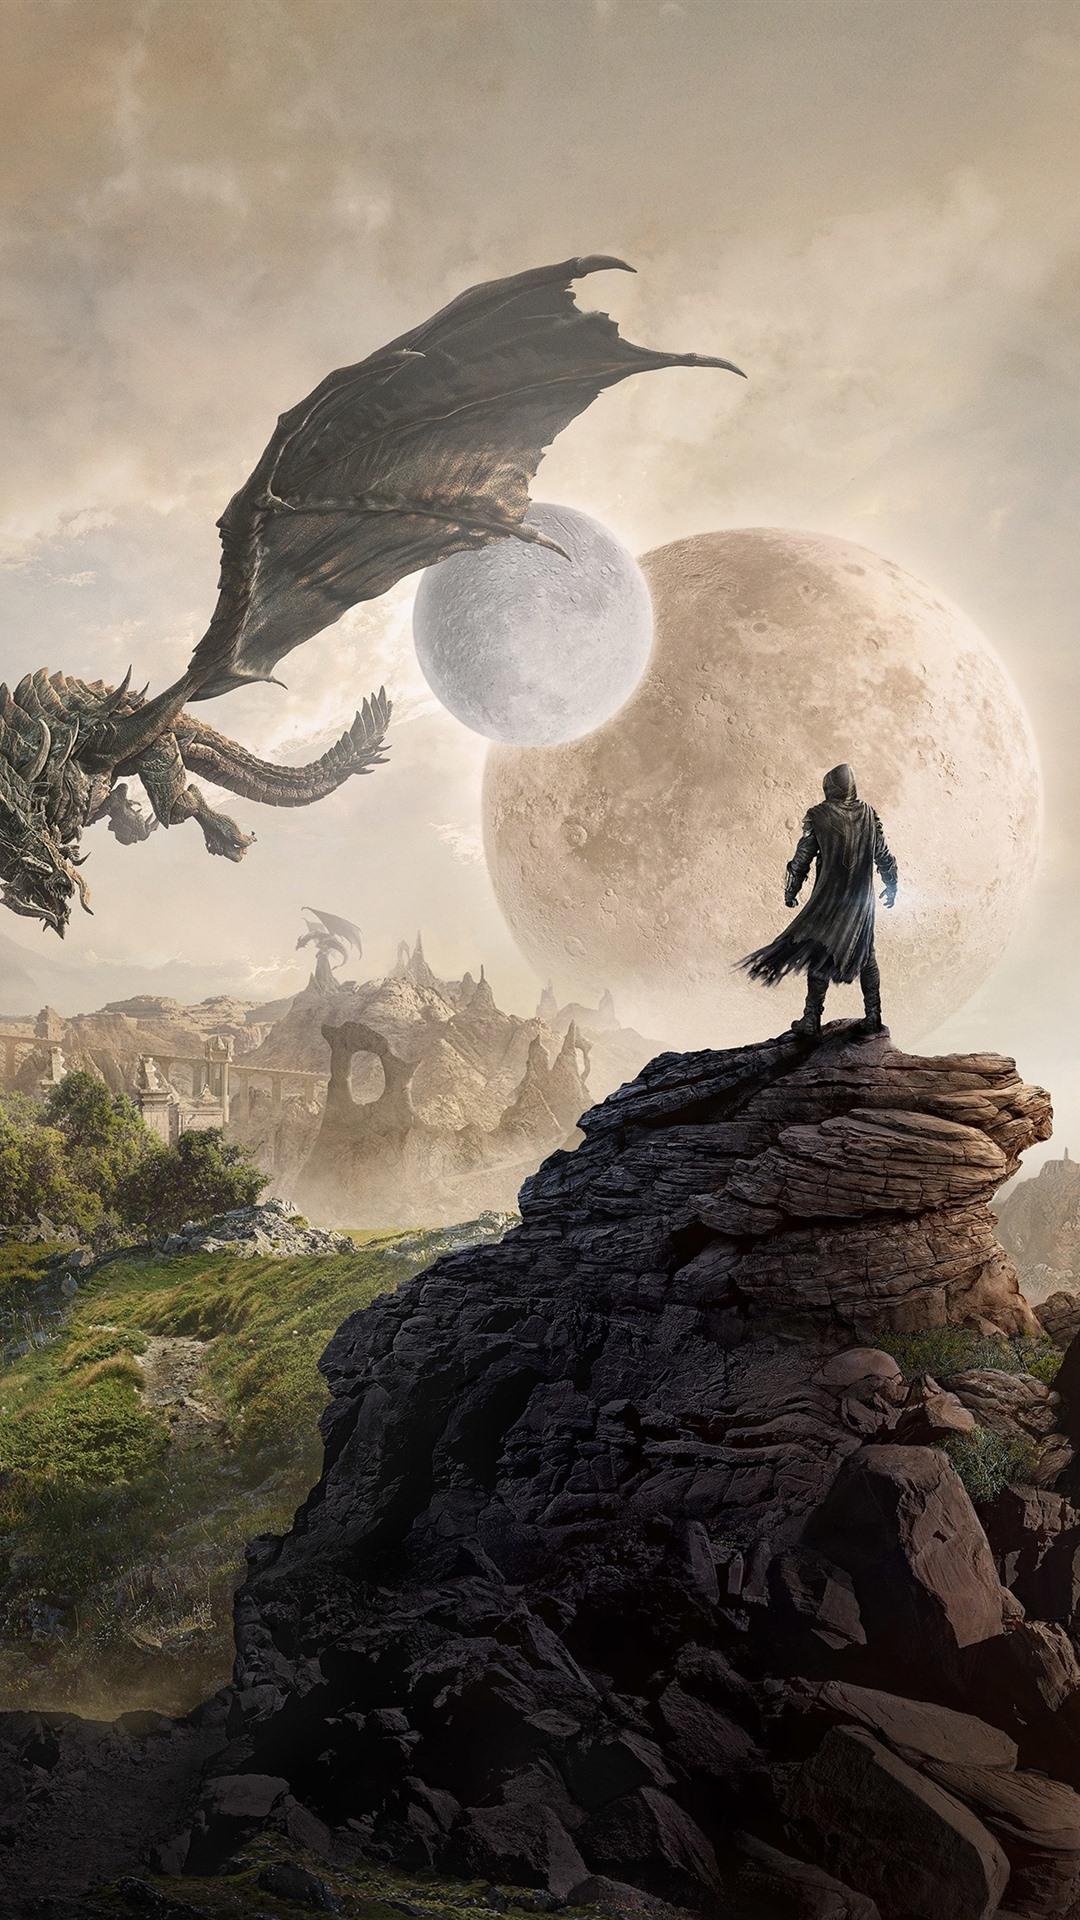 The Elder Scrolls City Moon Planet Dragon 1080x1920